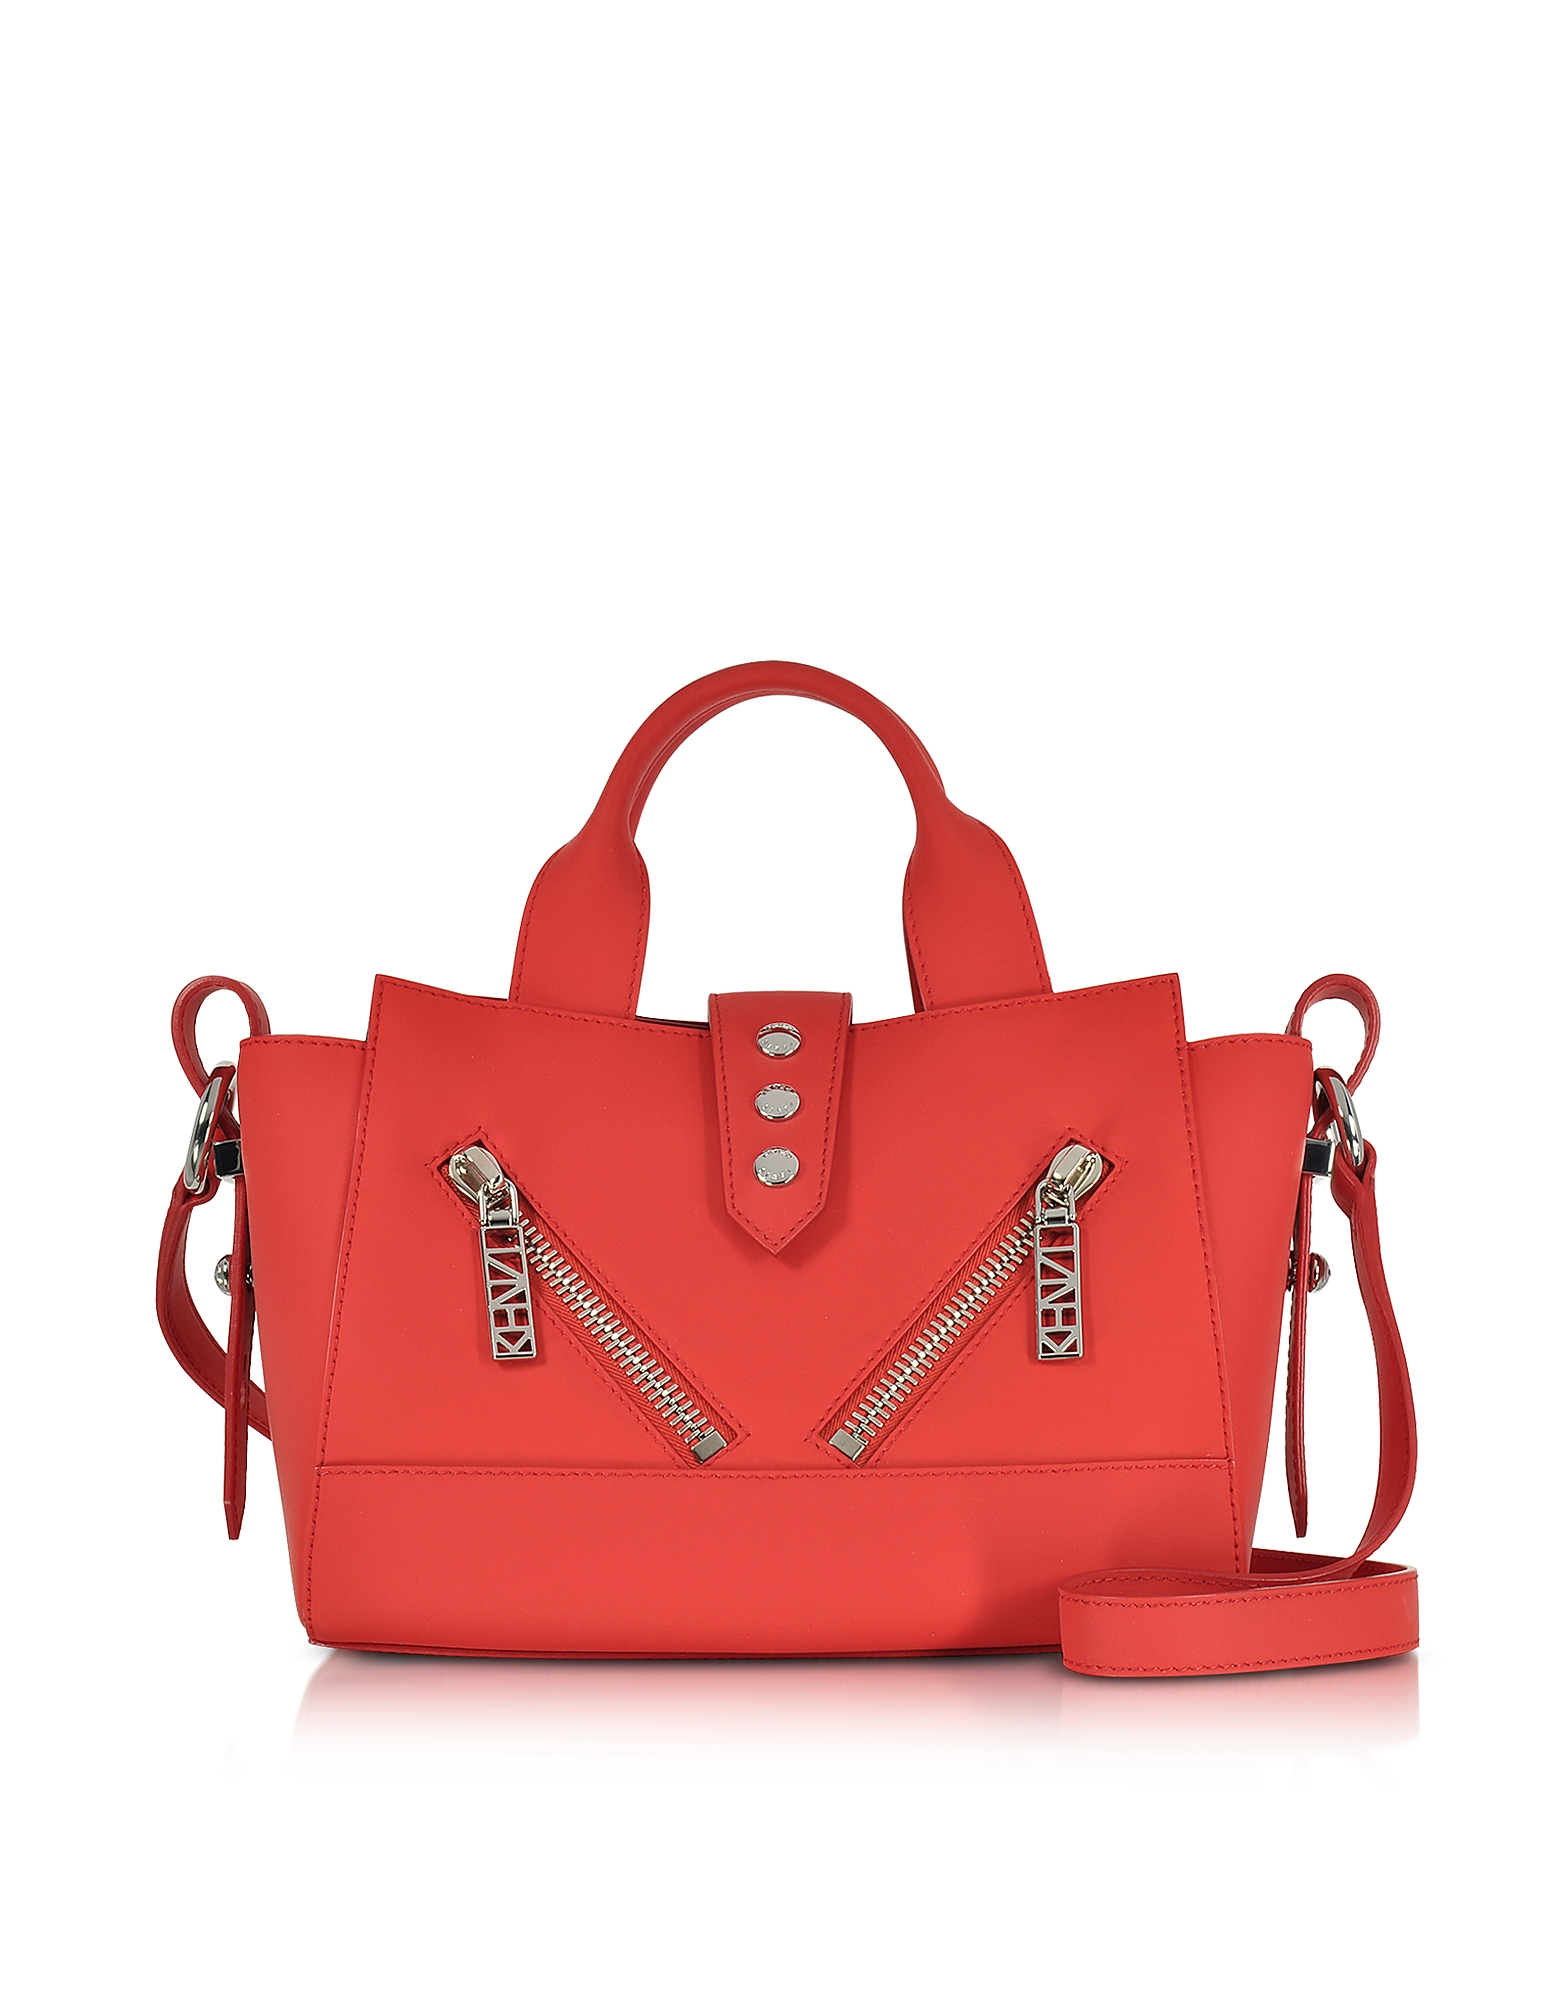 Kenzo Handbags, Fire Red Gommato Leather Mini Kalifornia Handbag